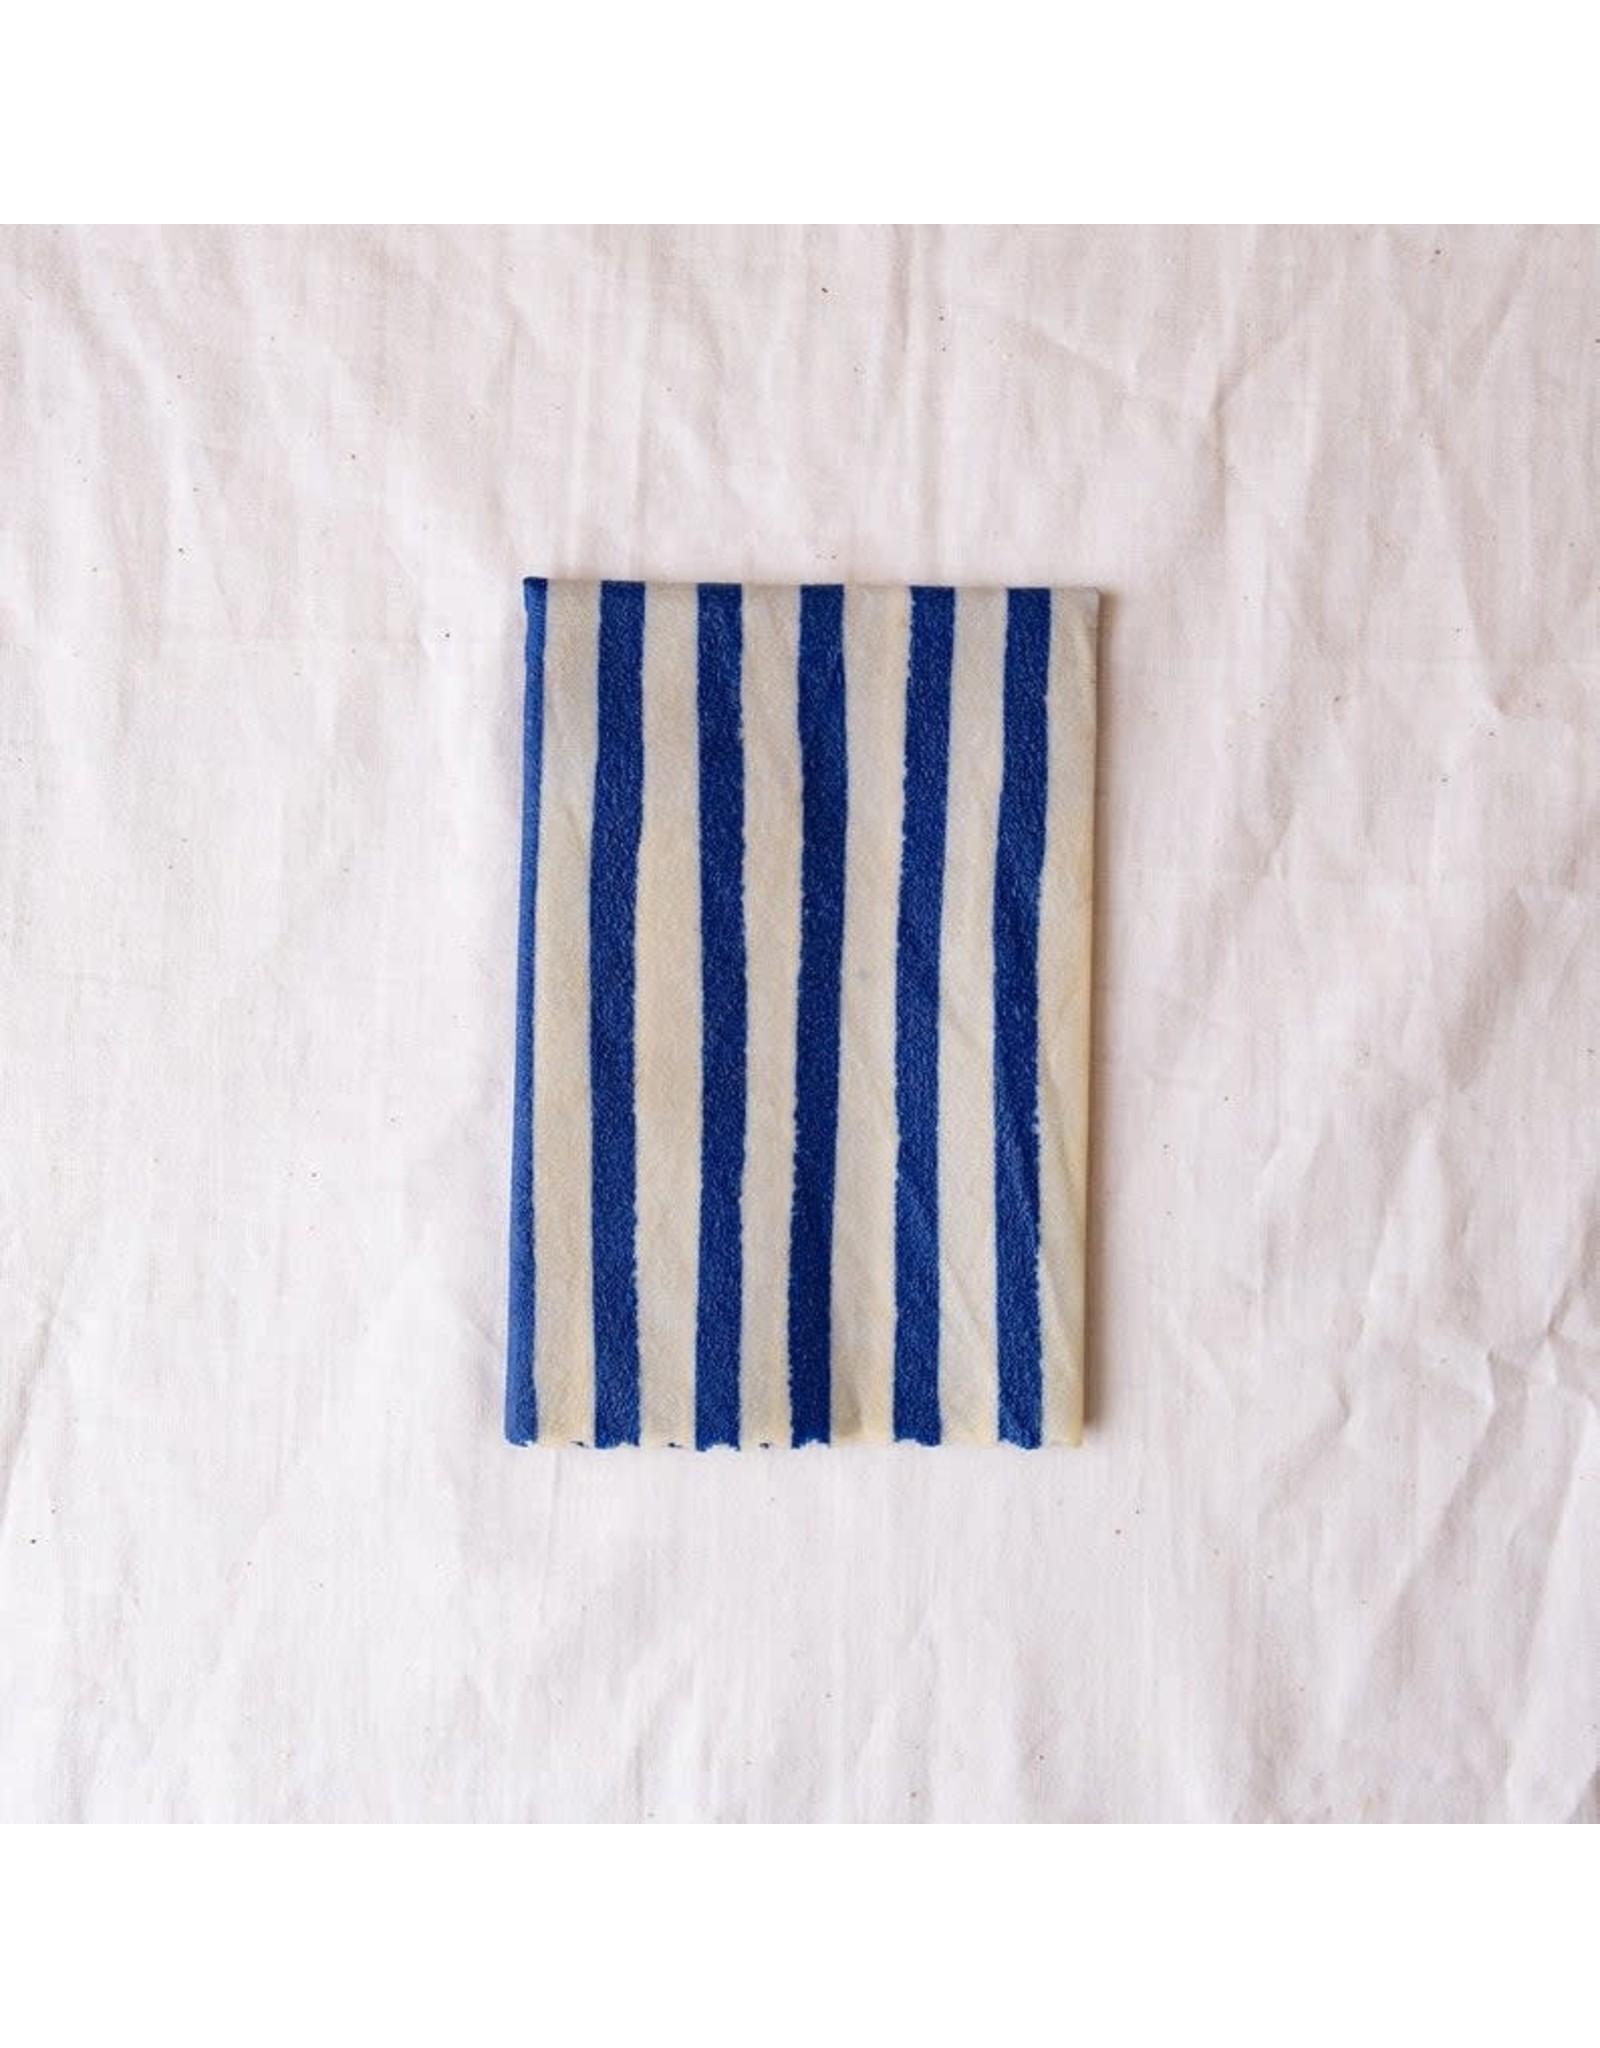 Mooshki Made Single Medium 'Nautical Blue'  Beeswax Wrap